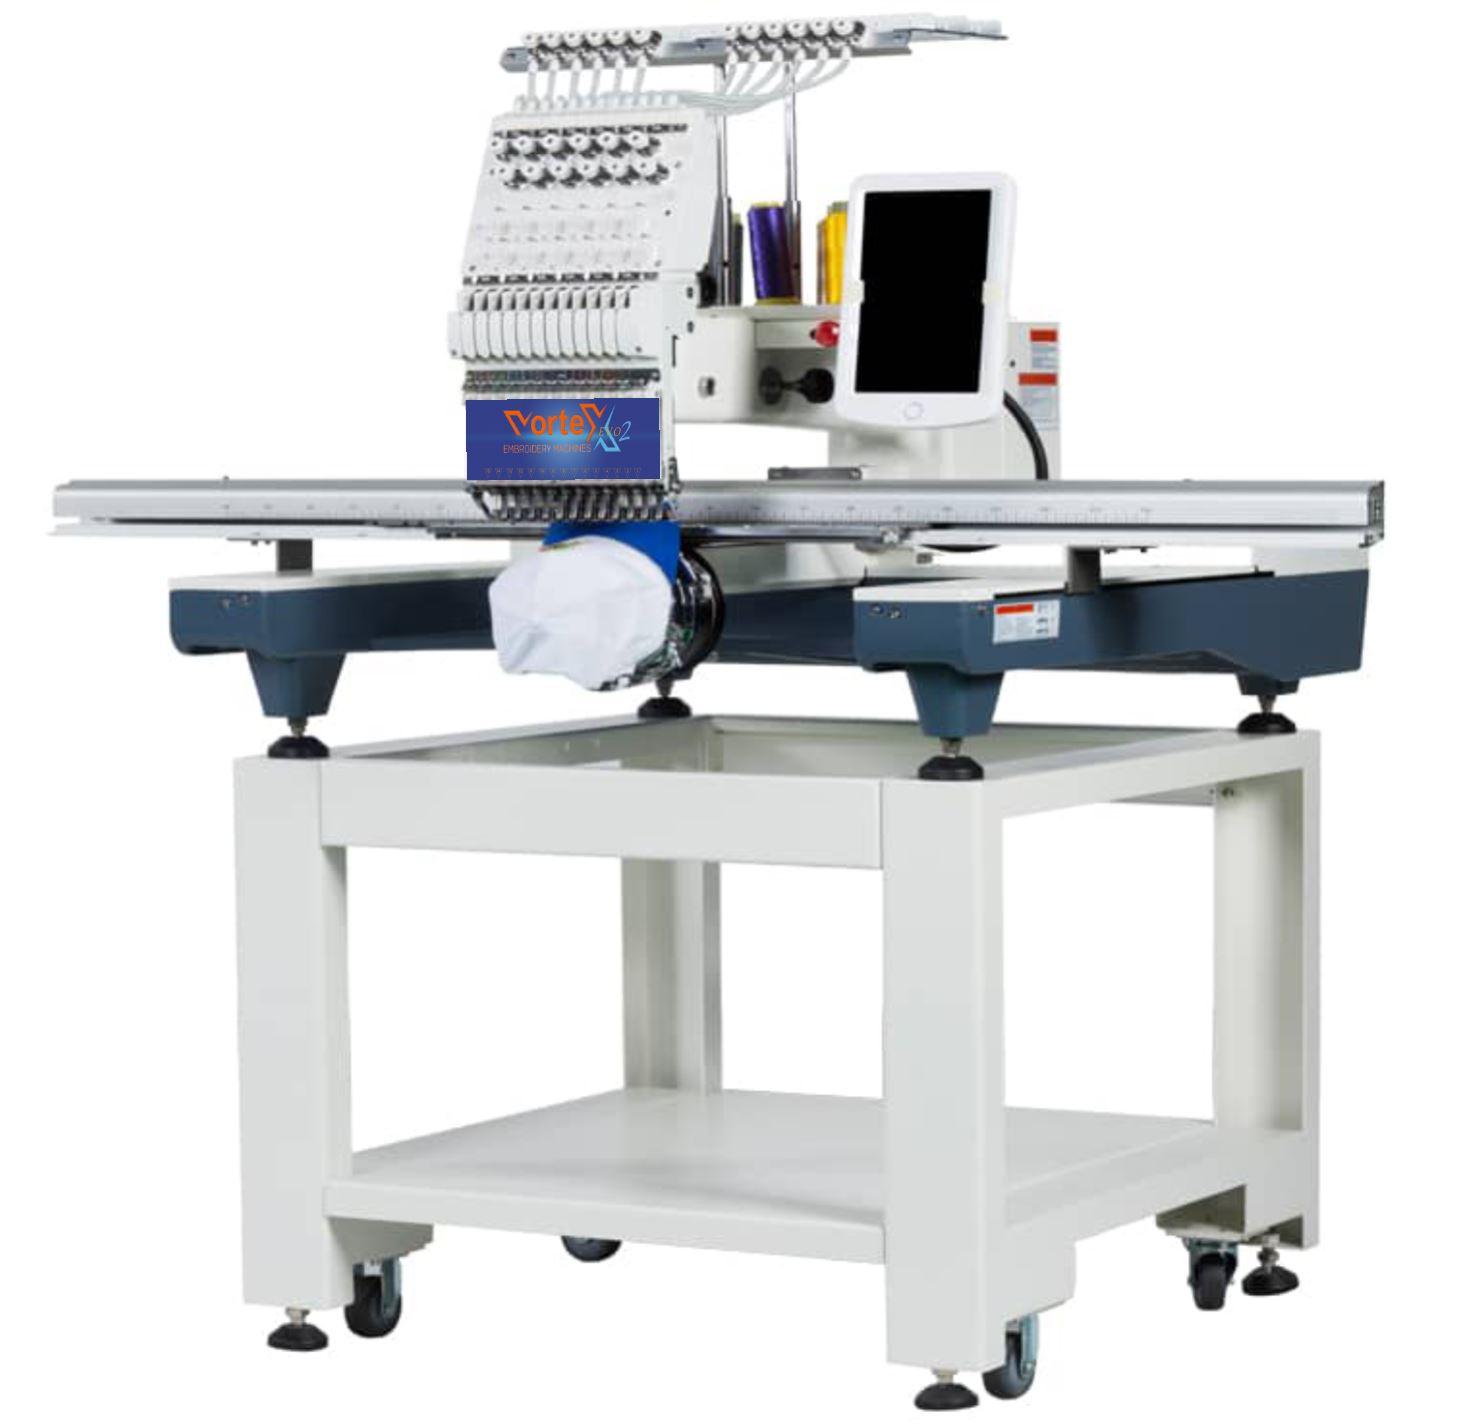 VC-X501-C-XL